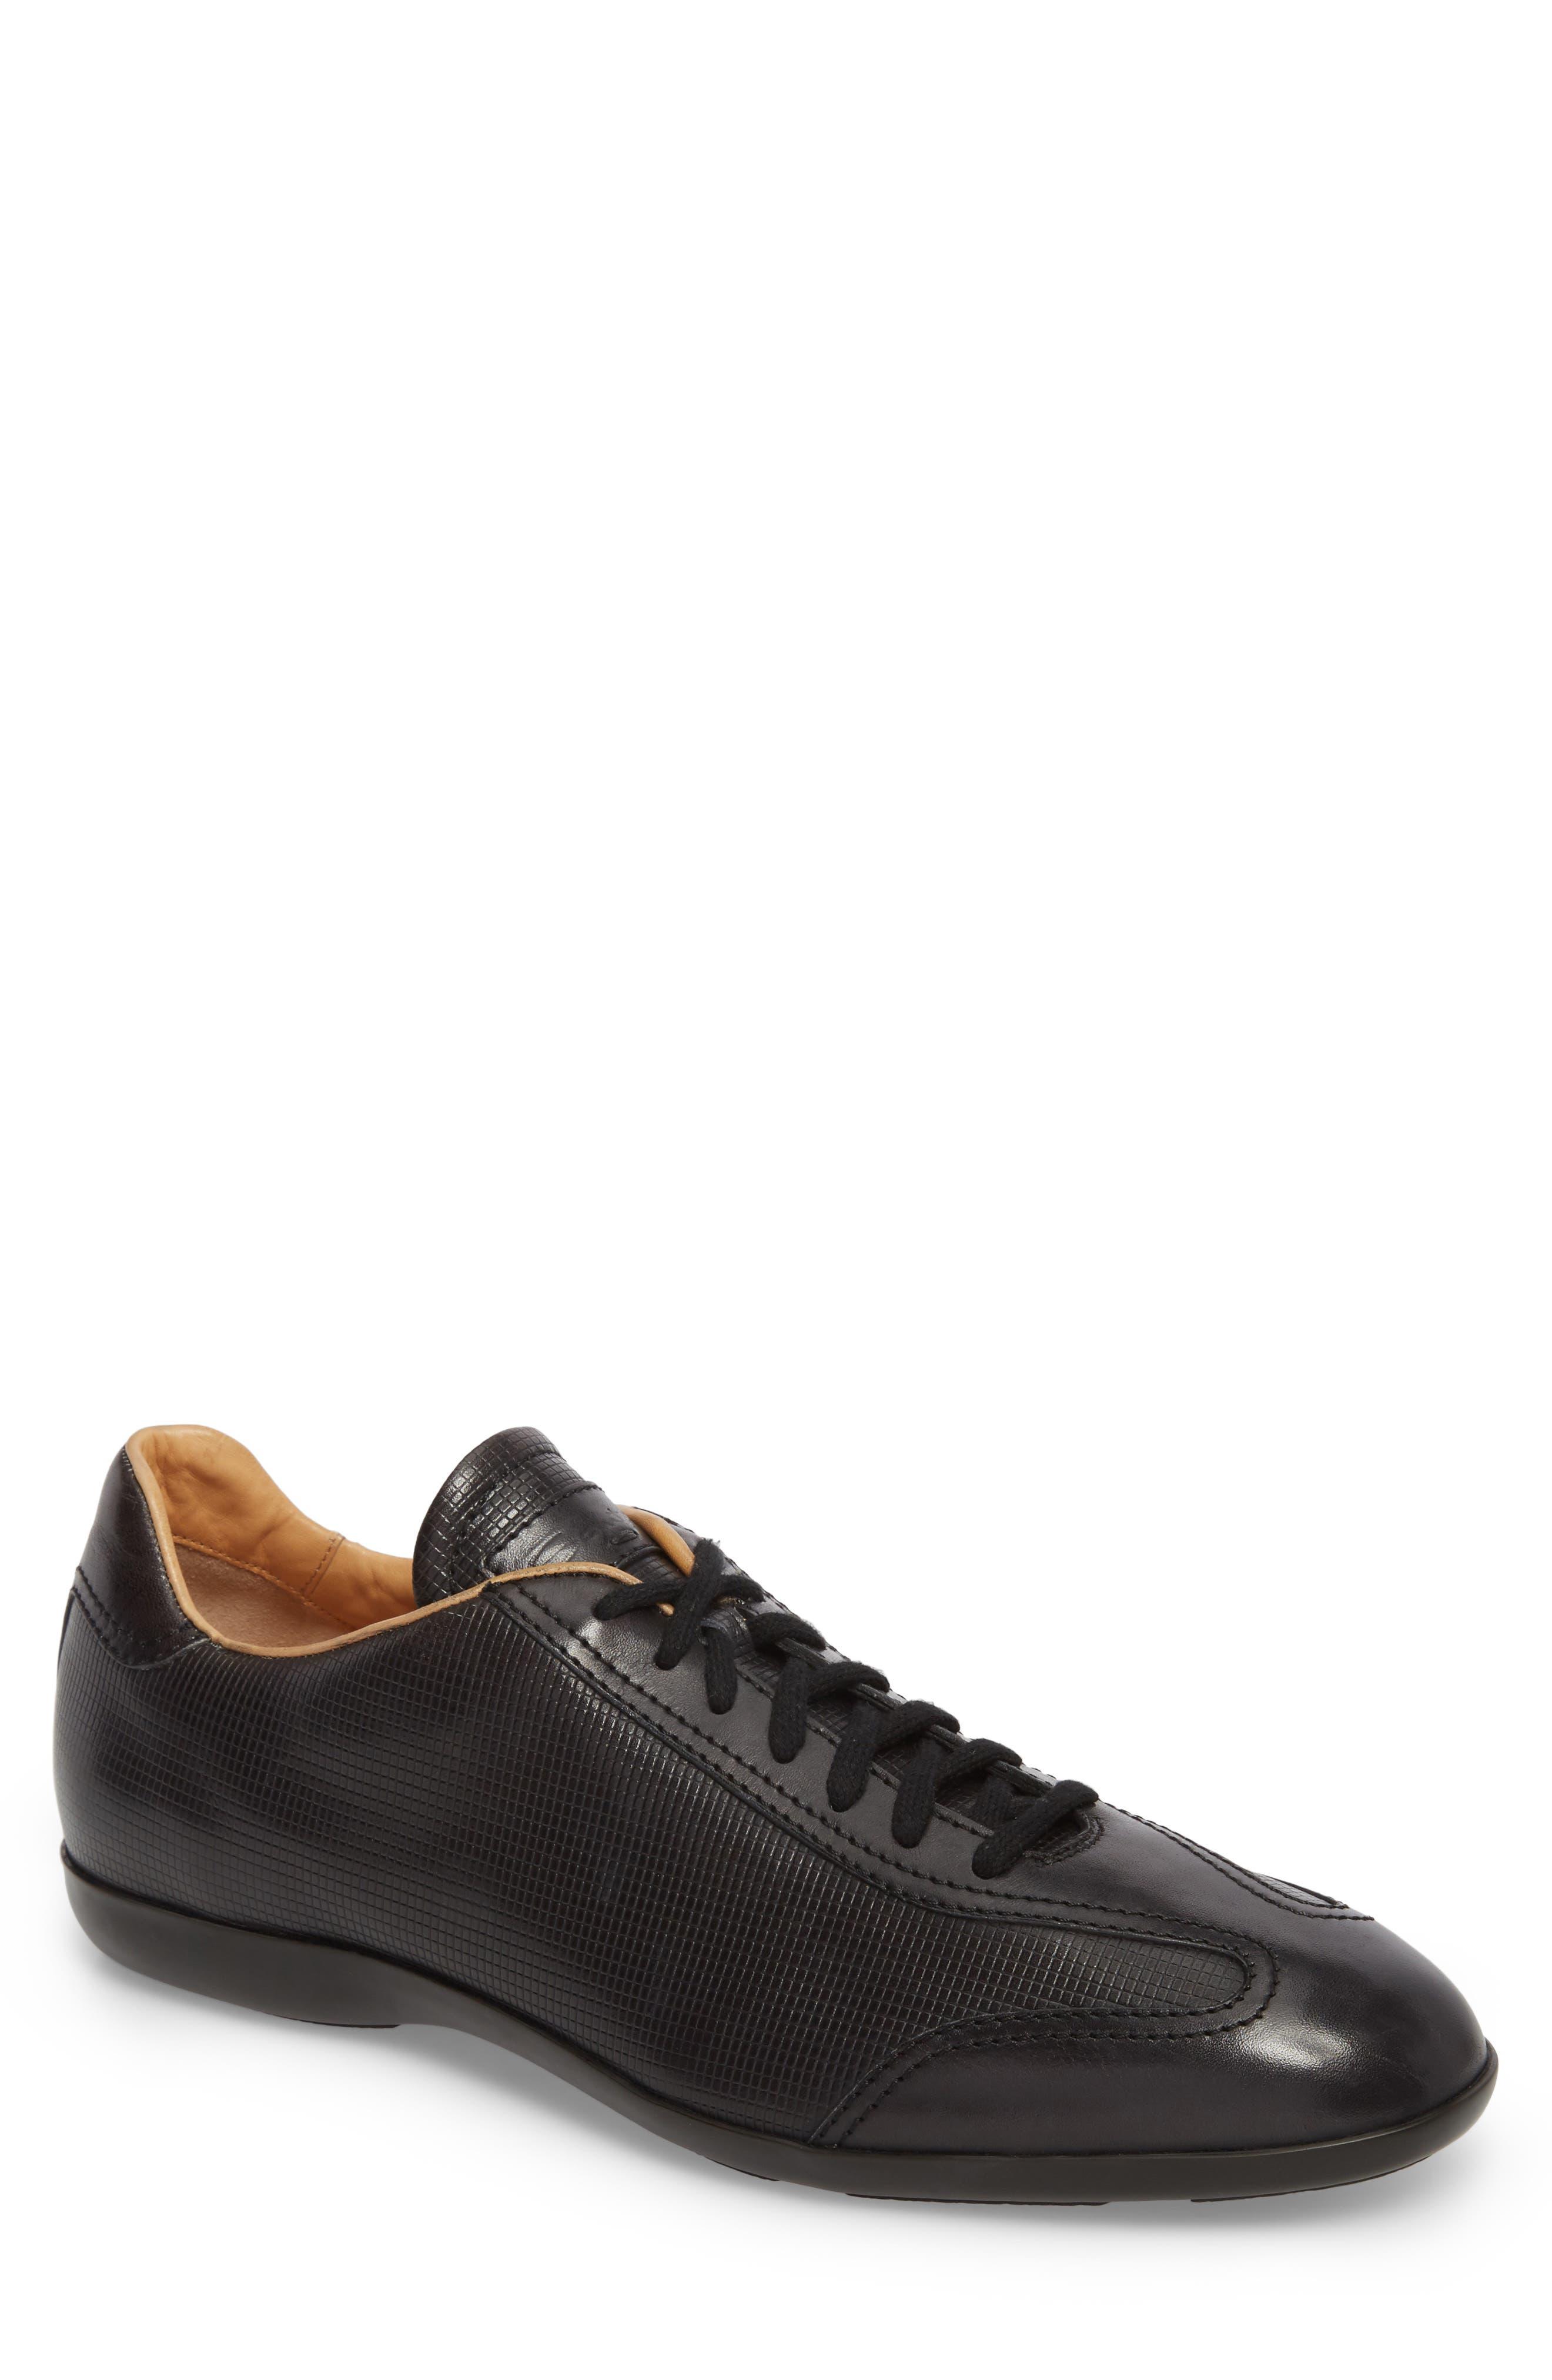 'Cortez' Sneaker,                             Main thumbnail 1, color,                             Brown Leather